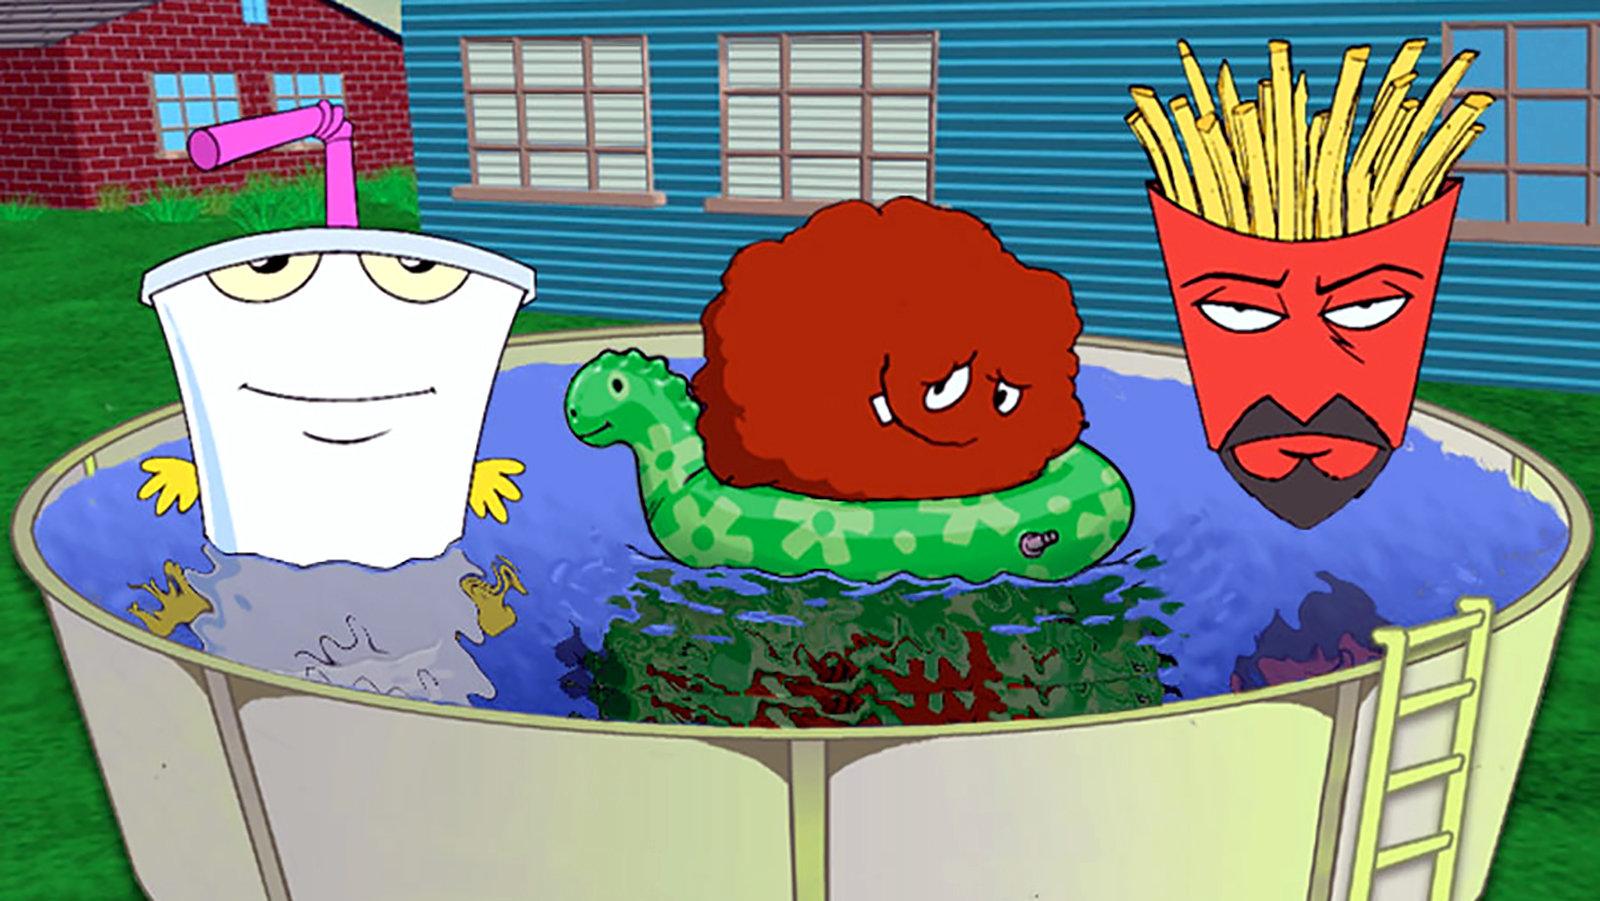 Powerpuff Girls Wallpaper Logo 11 Animated Shows For Grownups